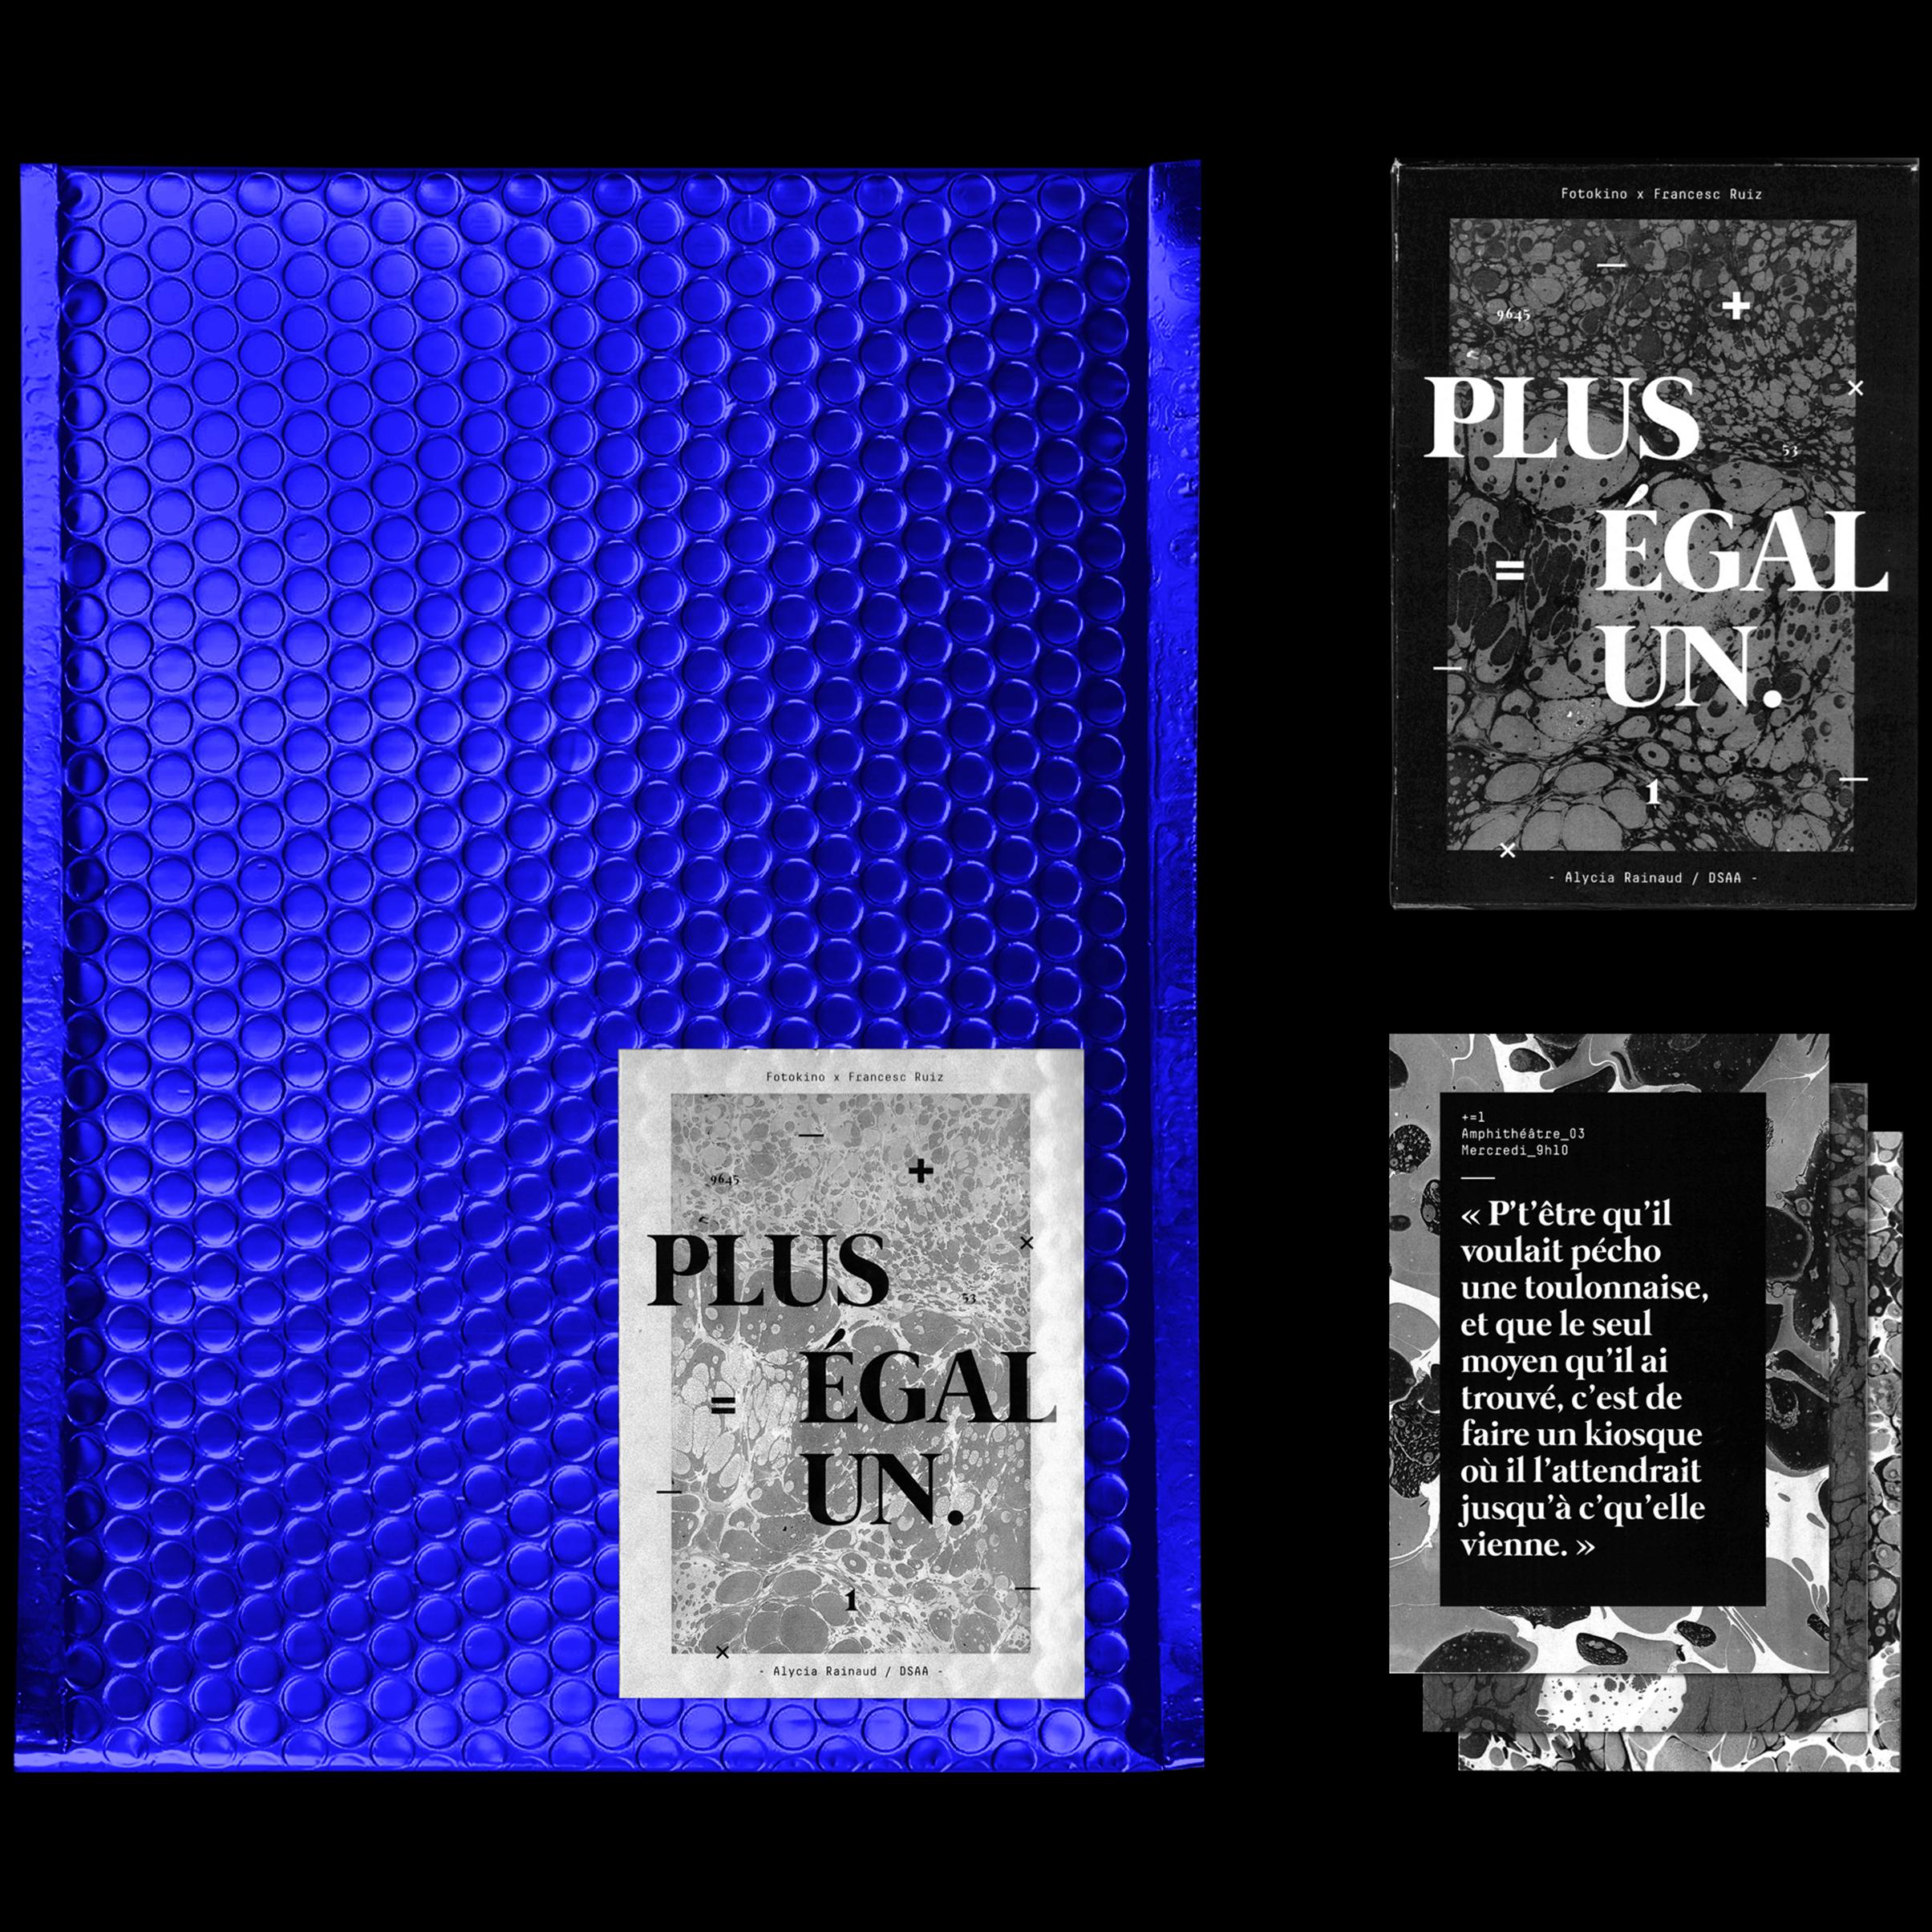 plusegalun-thumbnail-2